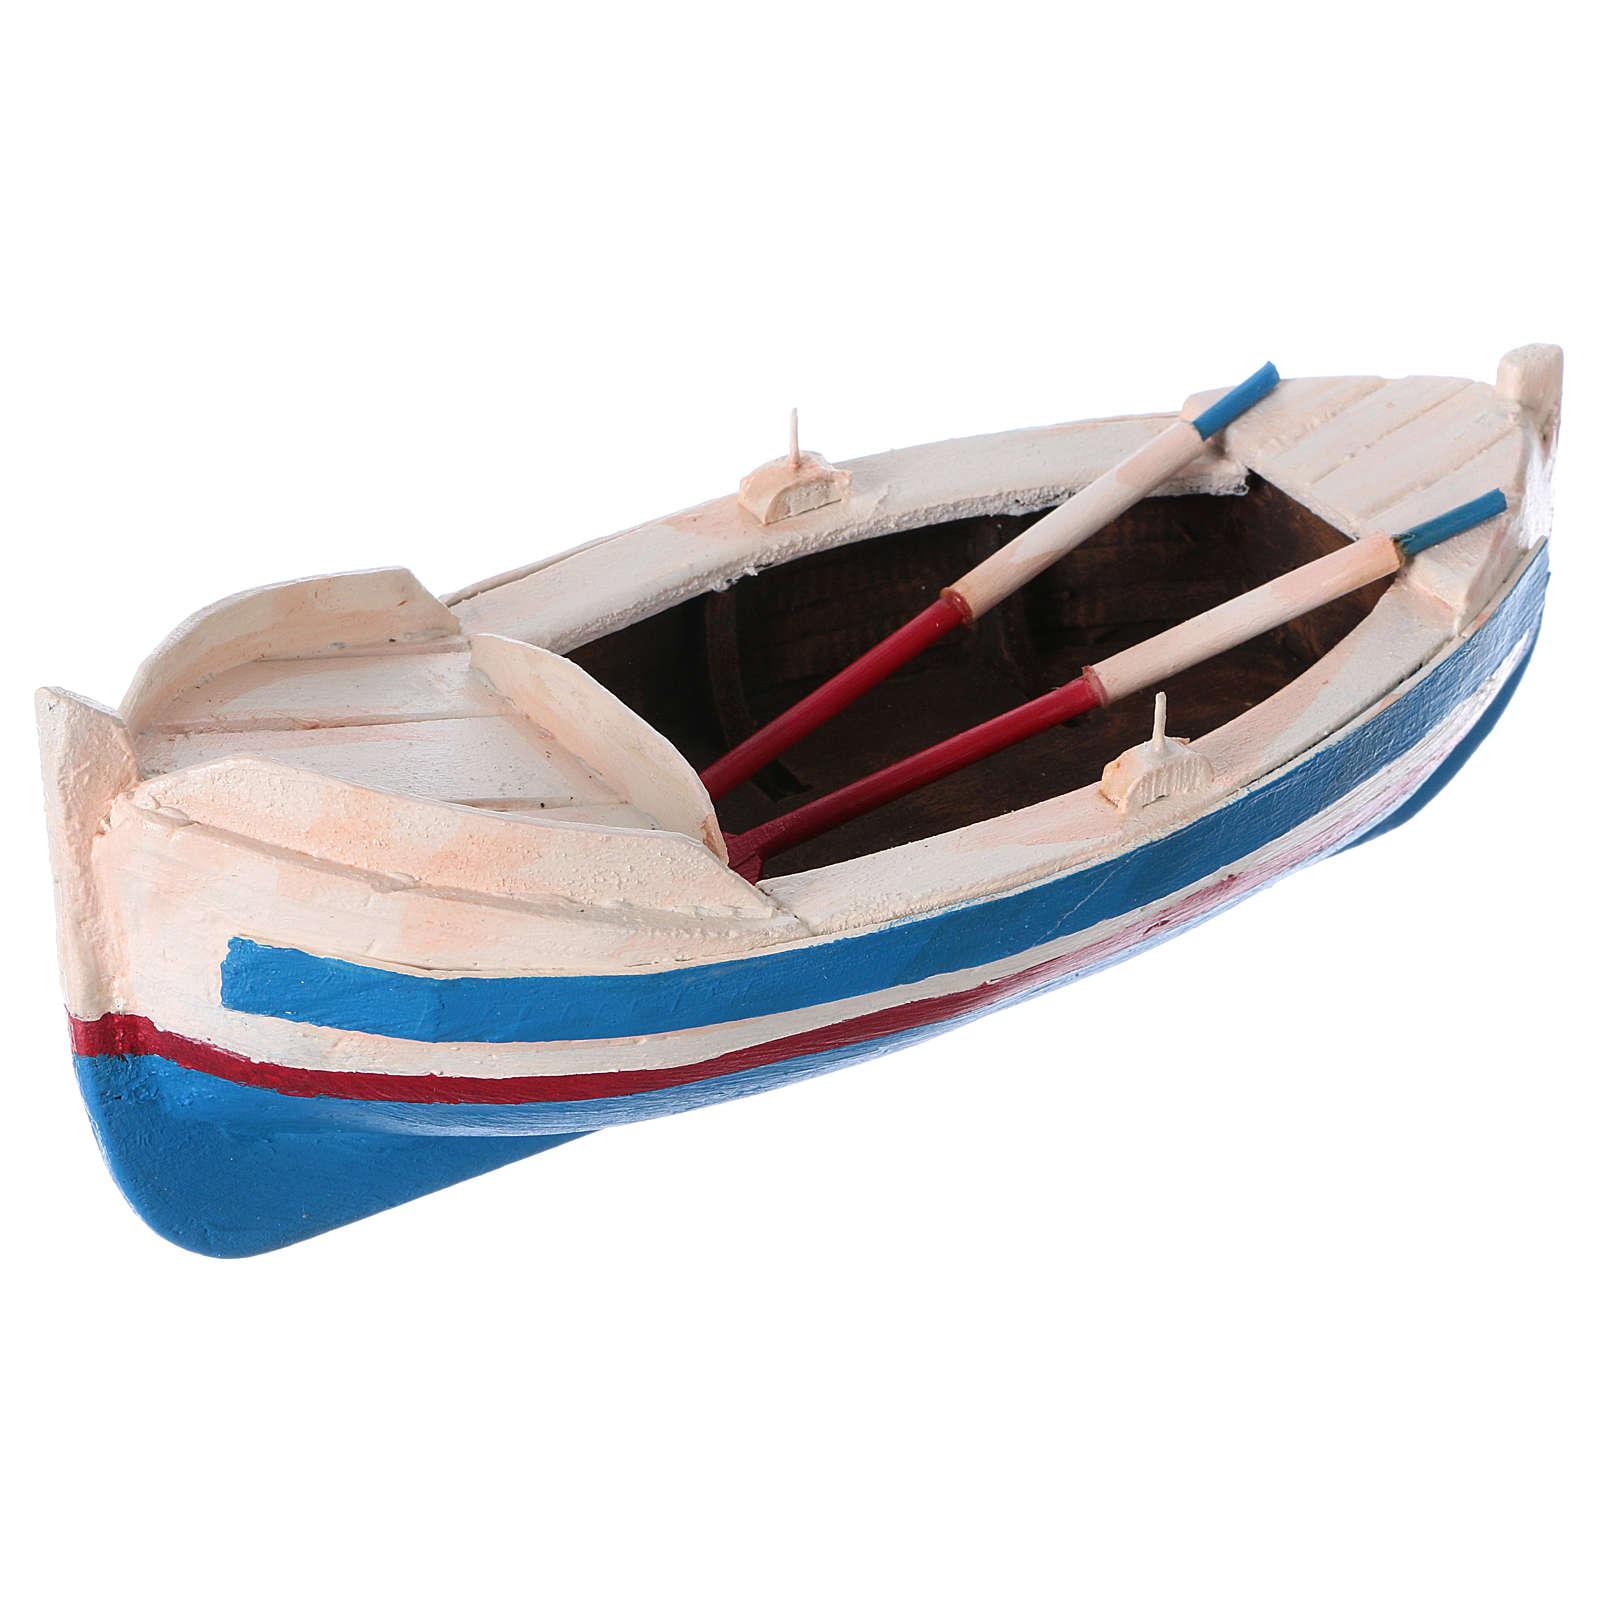 Piccola barca presepe da 10 cm 4